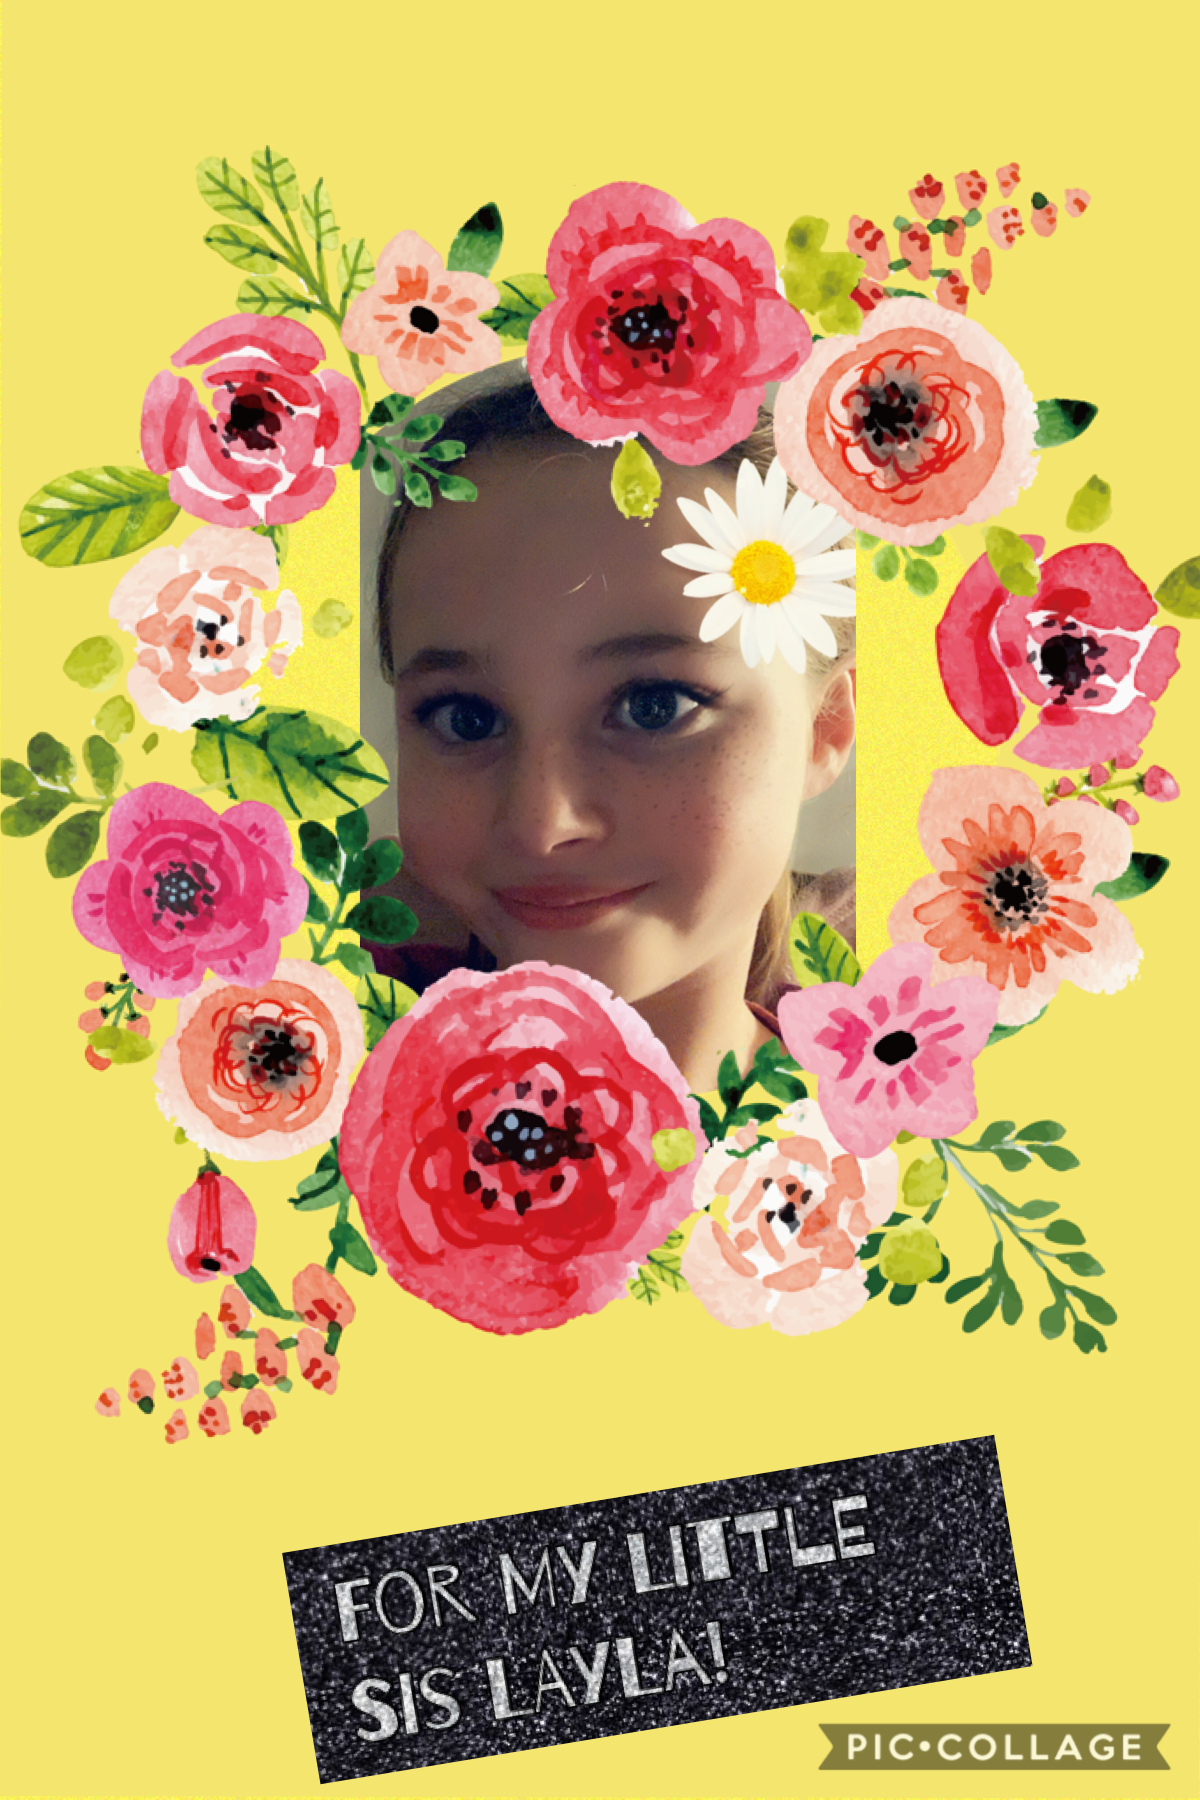 My little sis Layla